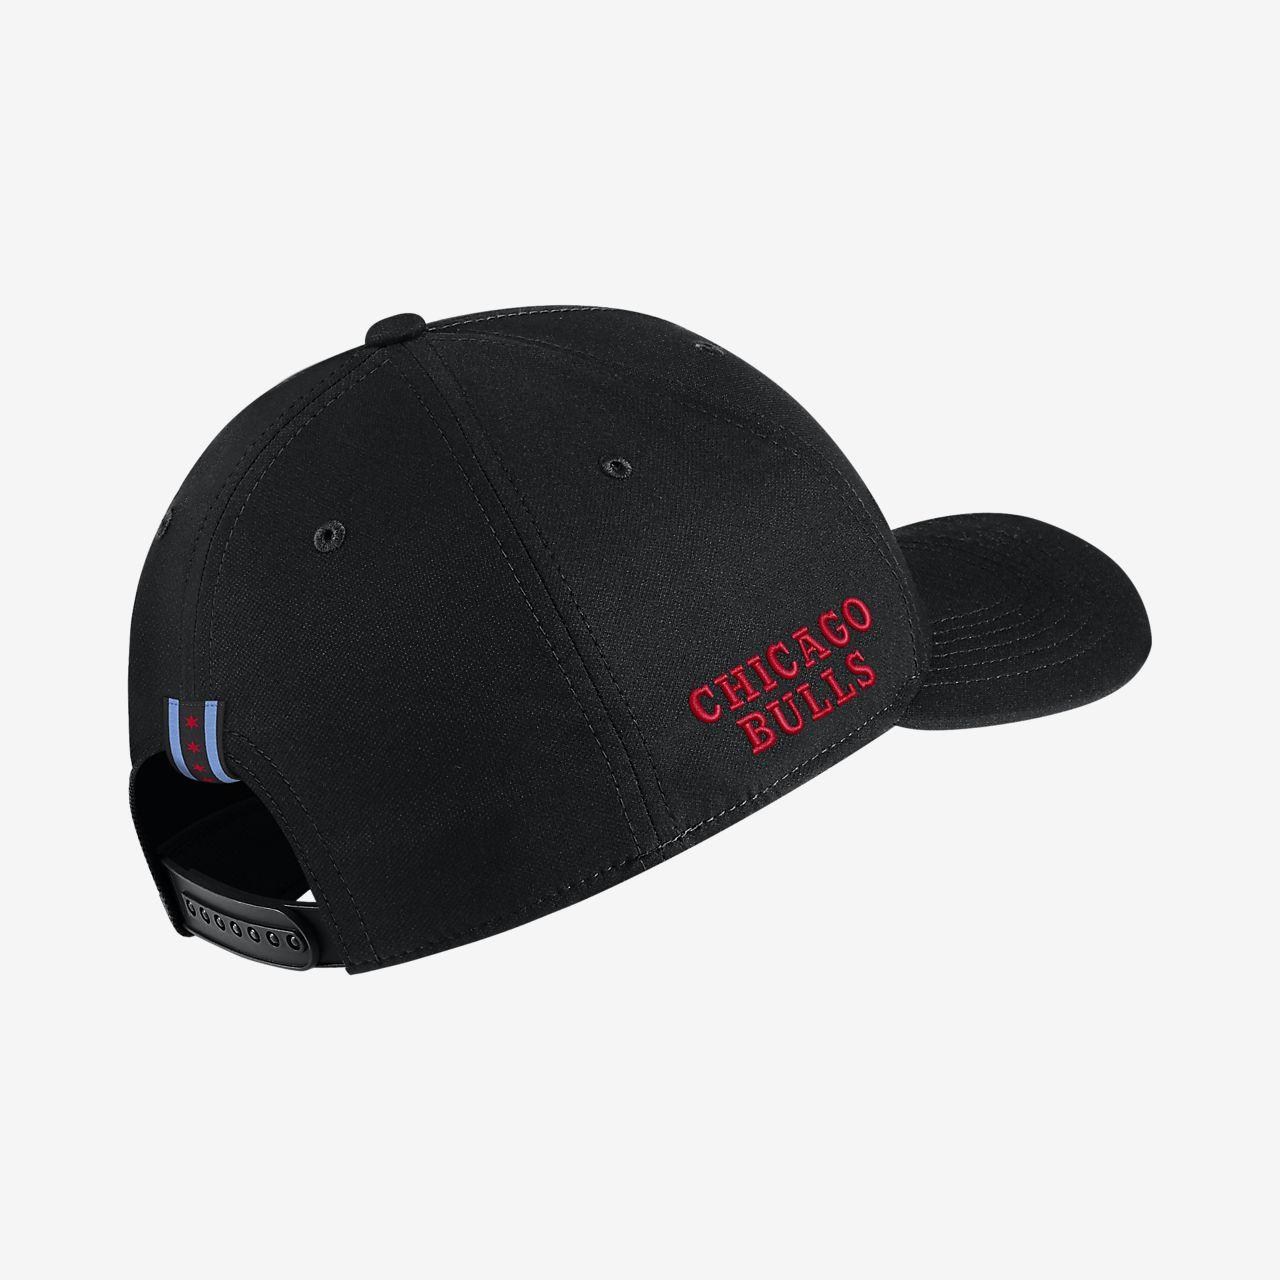 34bcc49b97095 Chicago Bulls City Edition Nike AeroBill Classic99 NBA Hat. Nike.com FI